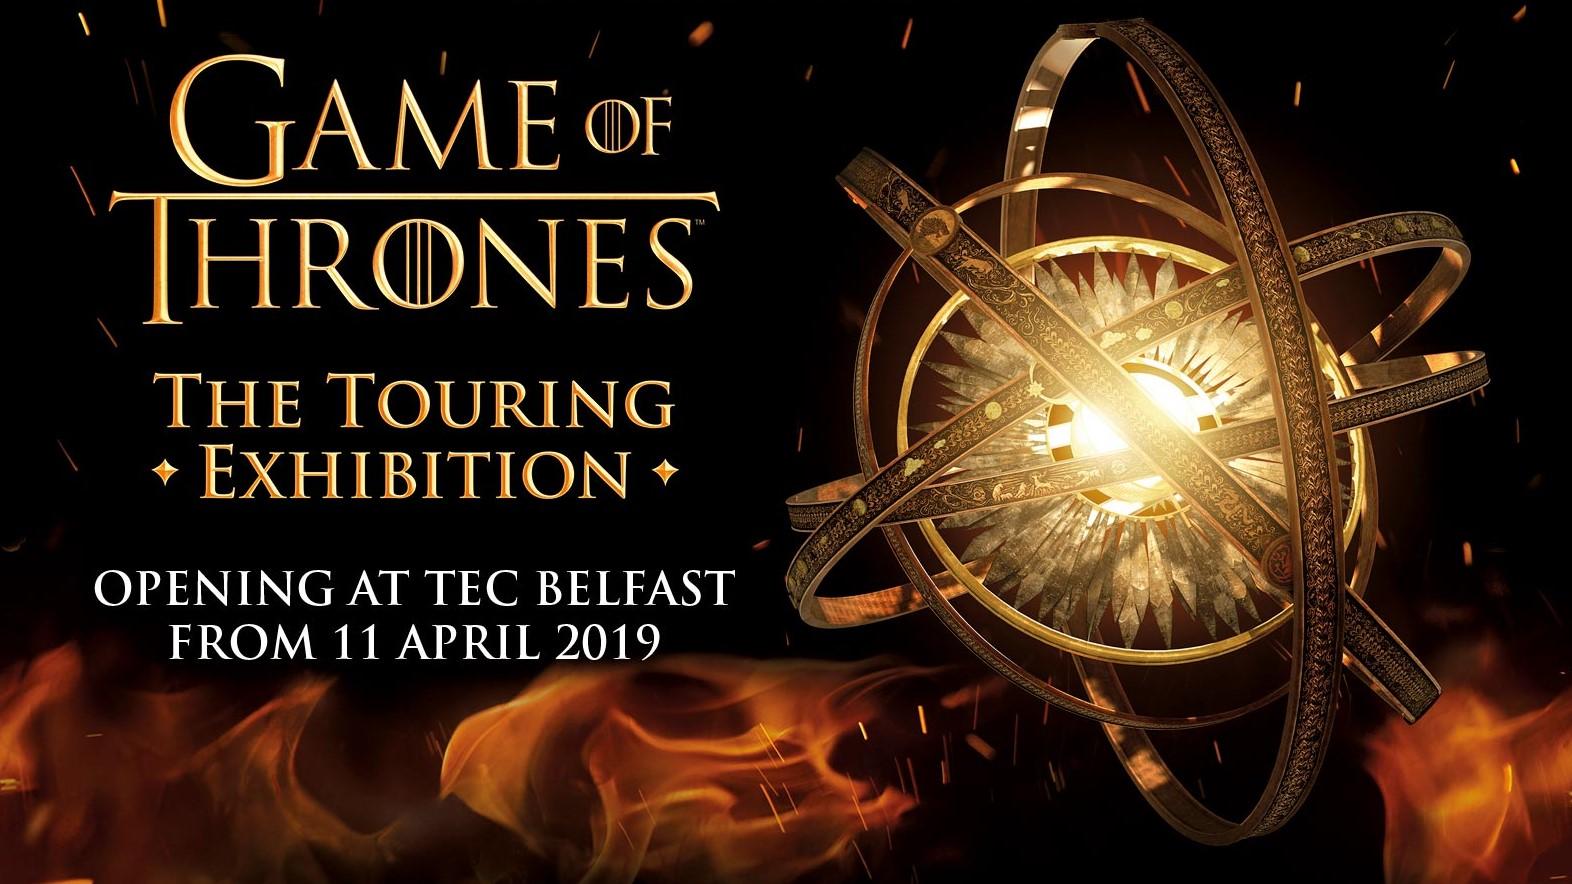 Game of Thrones Belfast Touring Exhibition